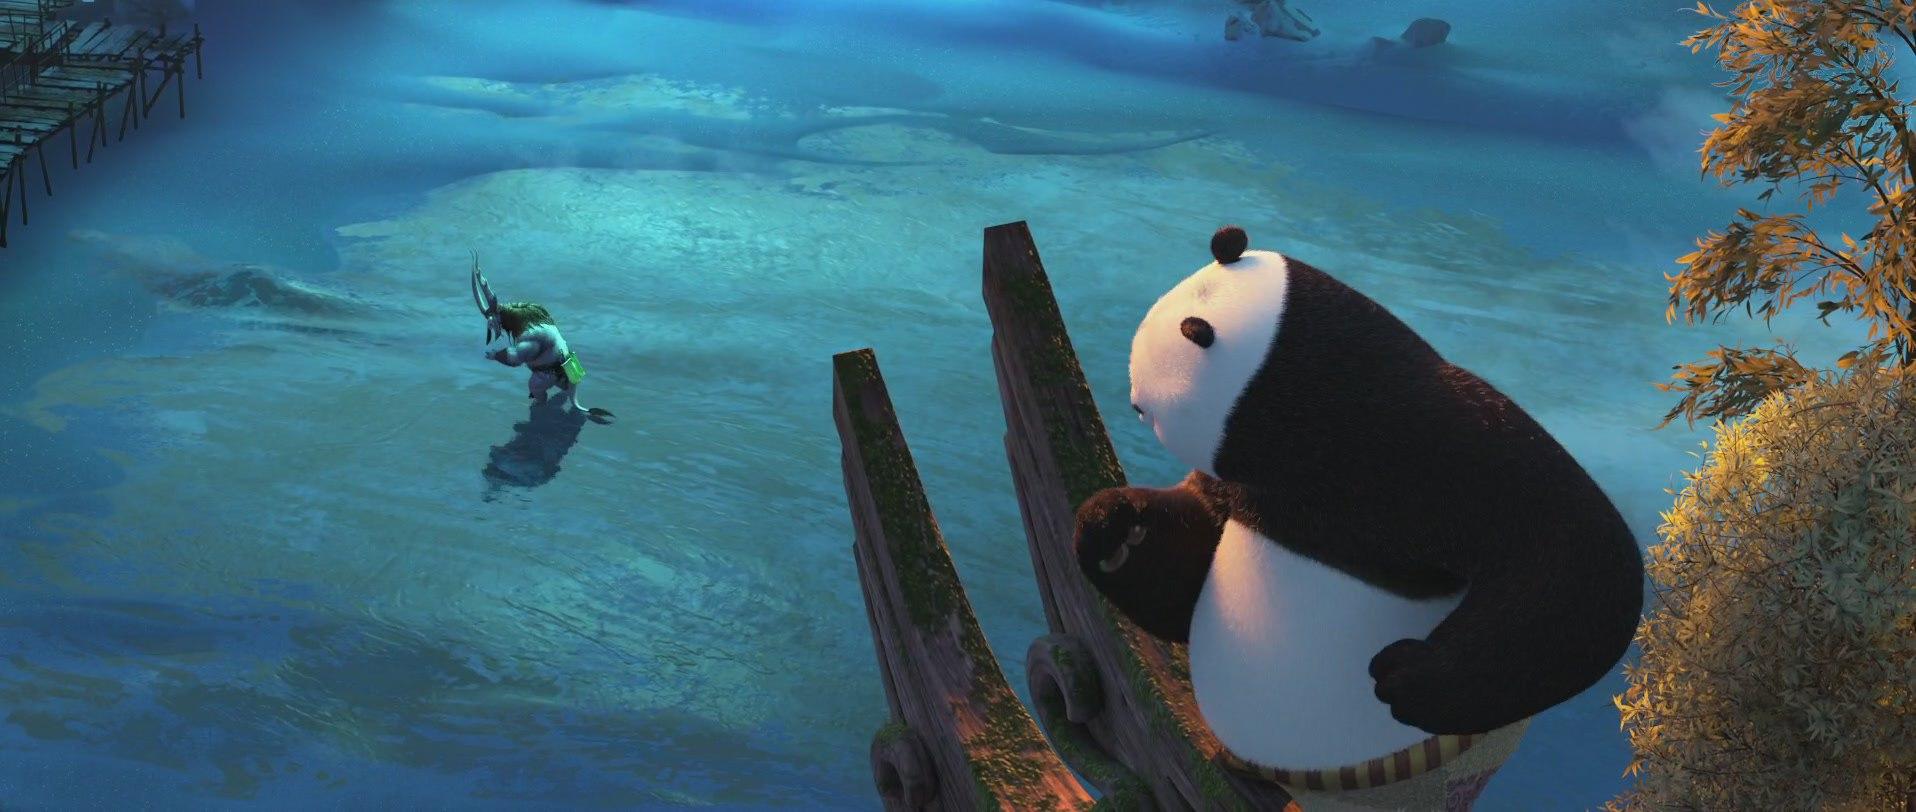 скидыш от кунг-фу панды